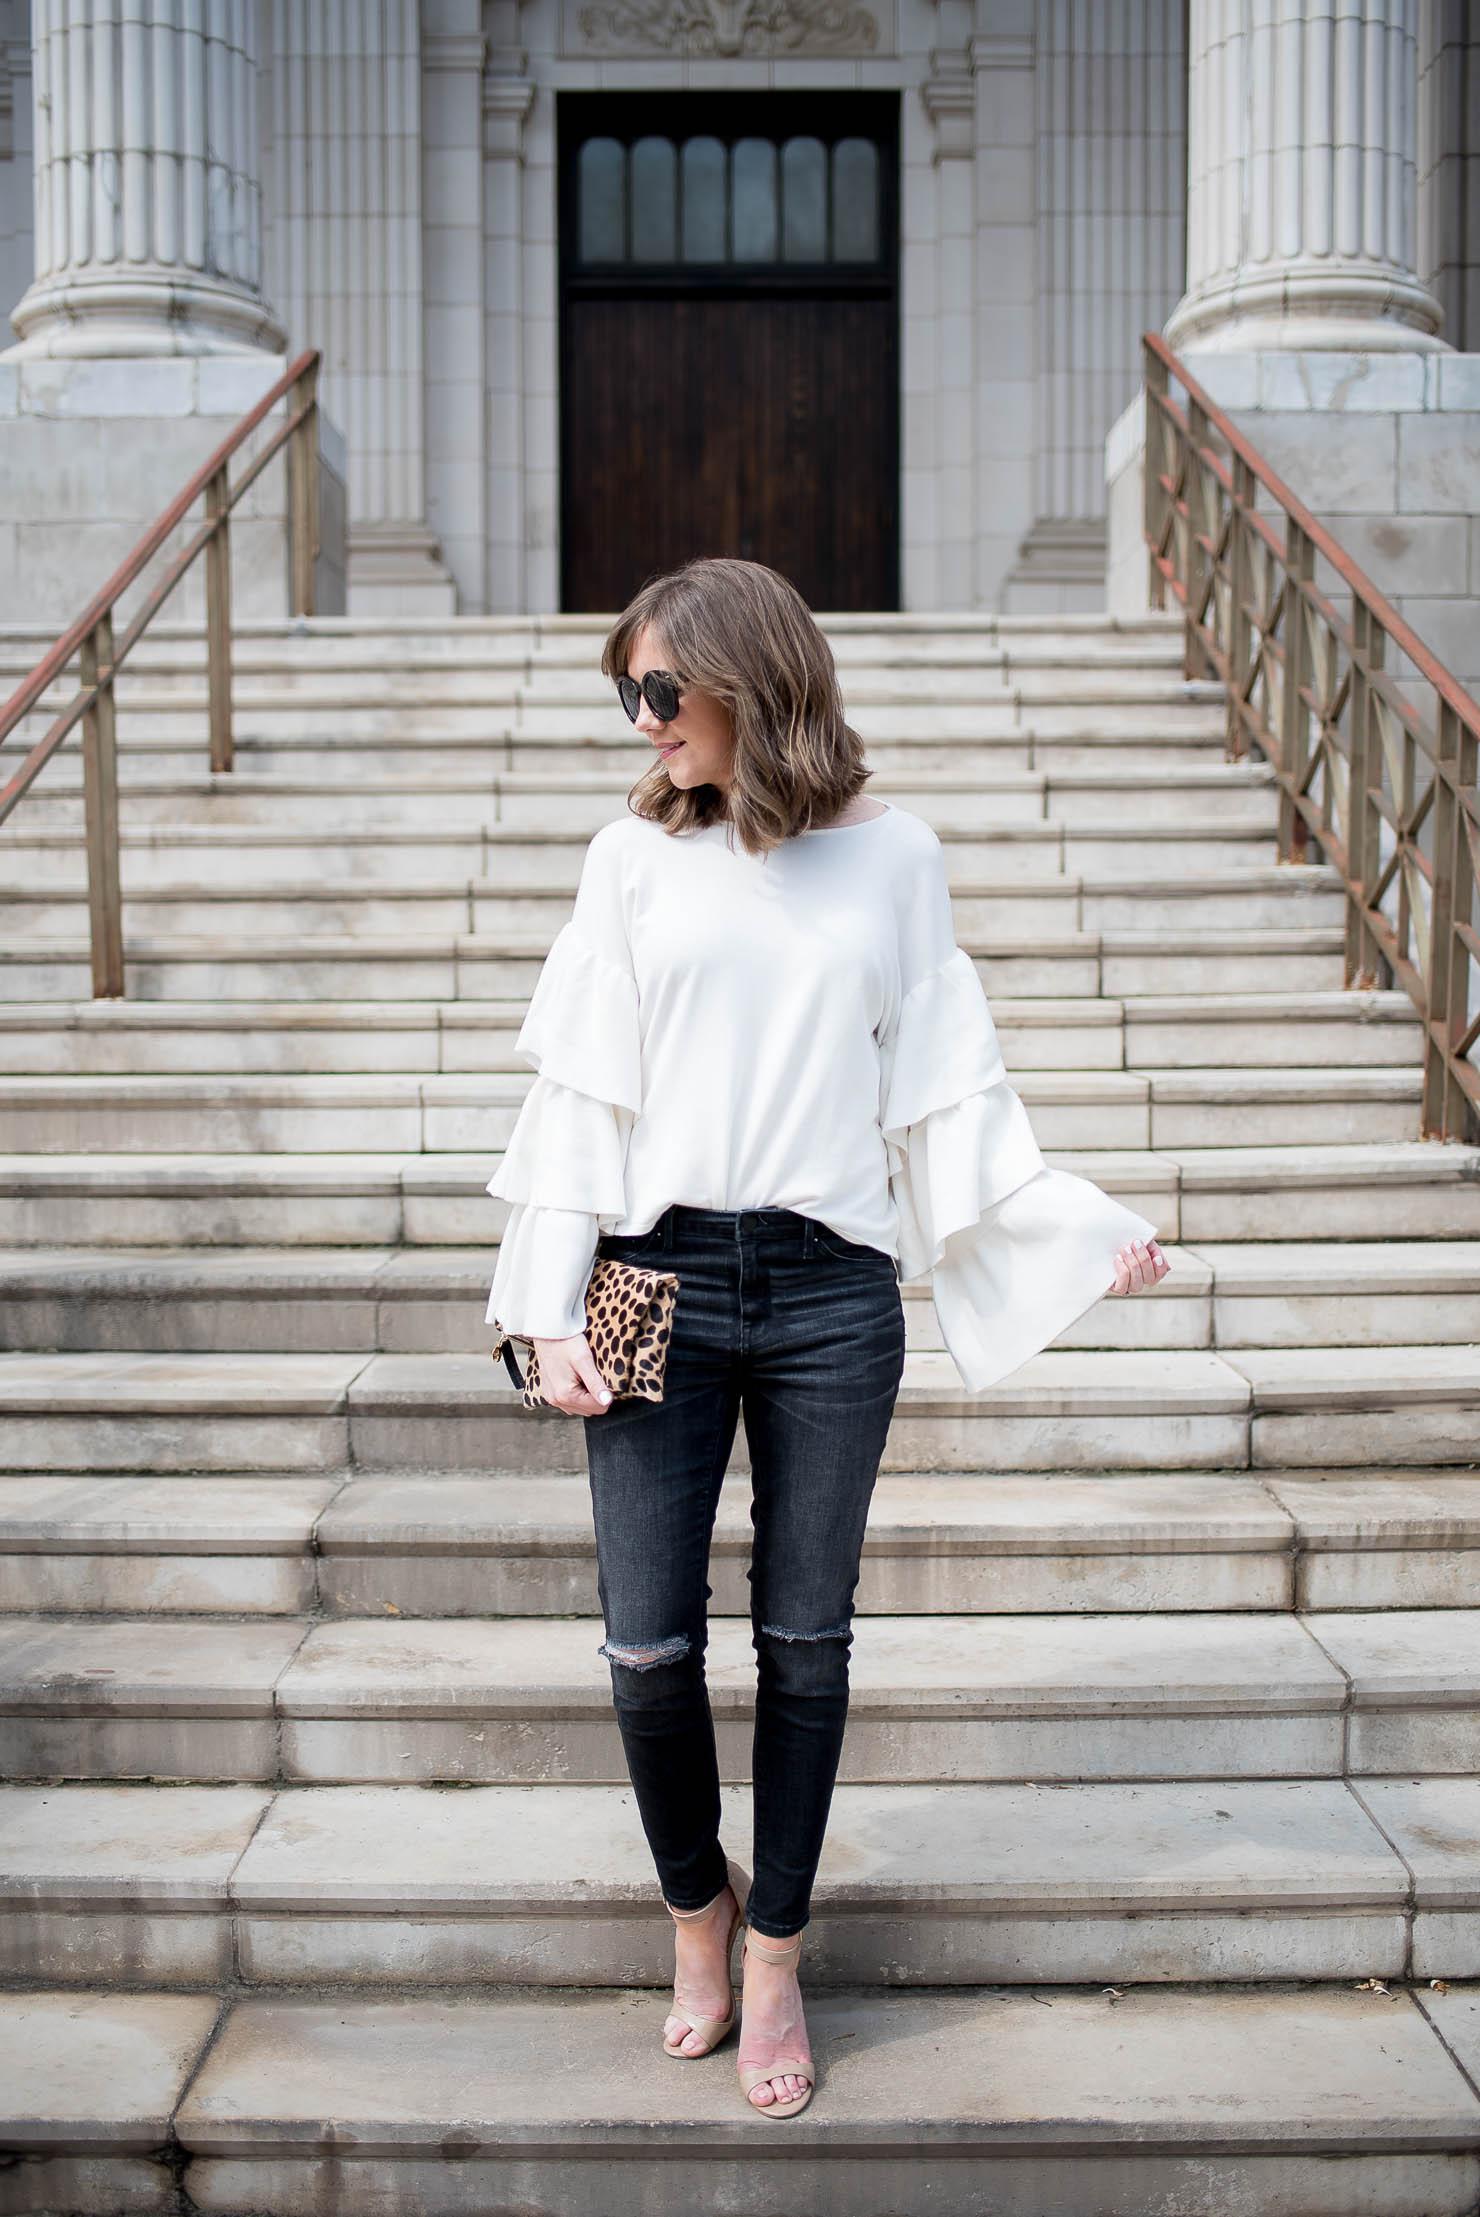 zara dramatic ruffle sleeve sweater, dark grey distressed jeans, leopard clutch, spring in chicago